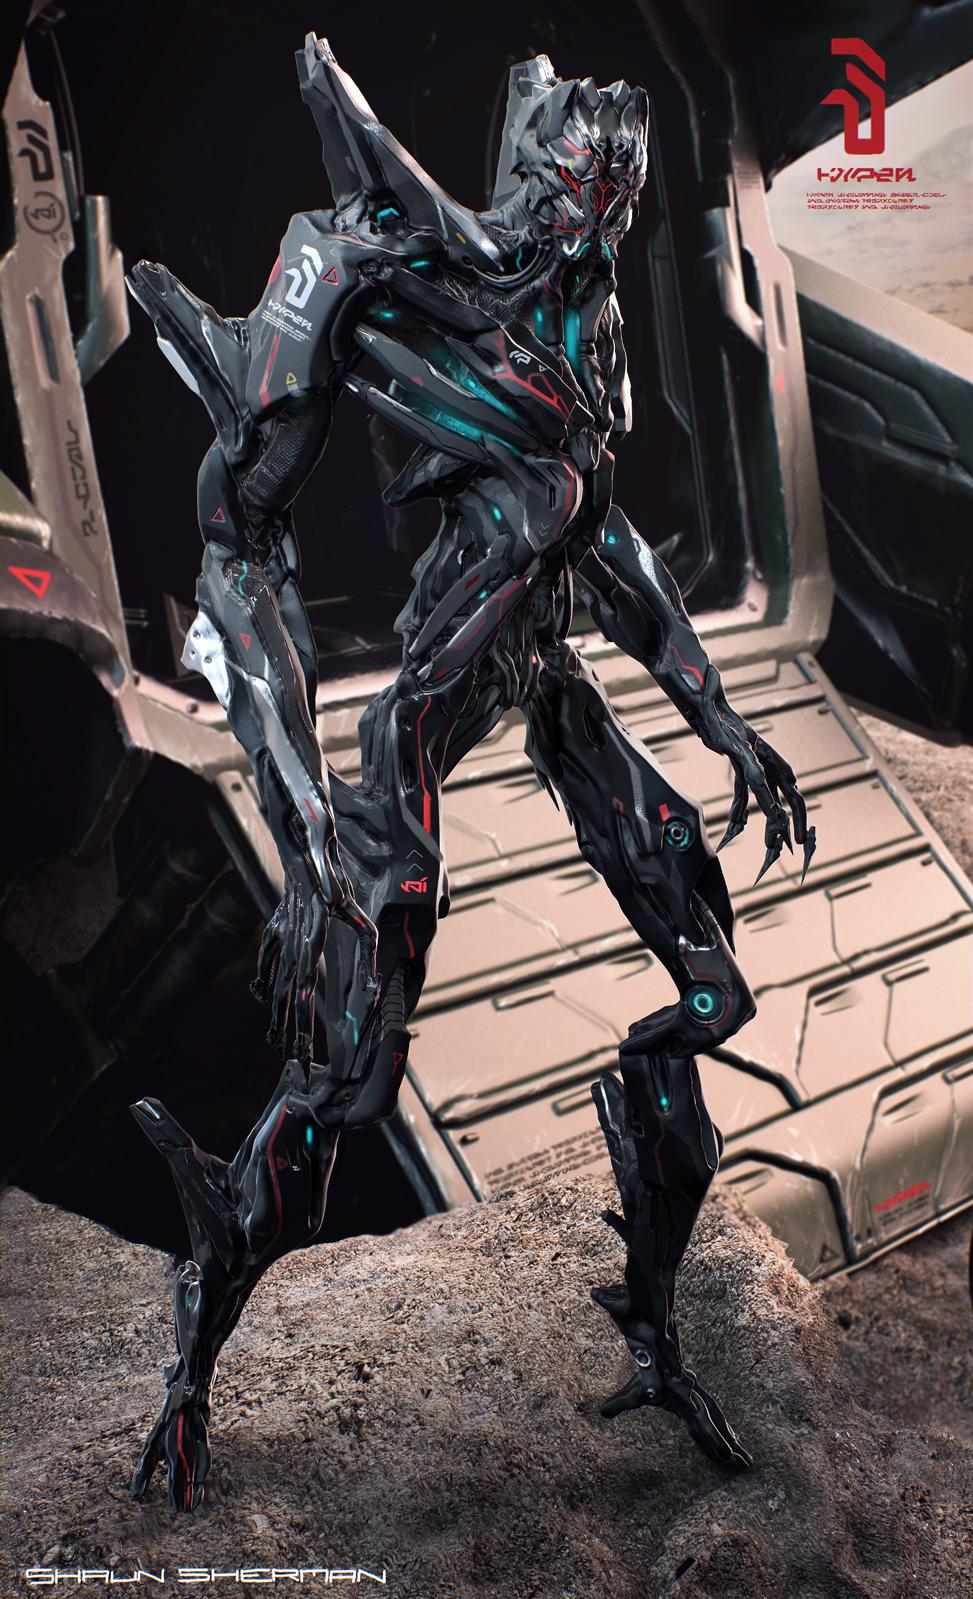 Alien Invader by Shaun Sherman